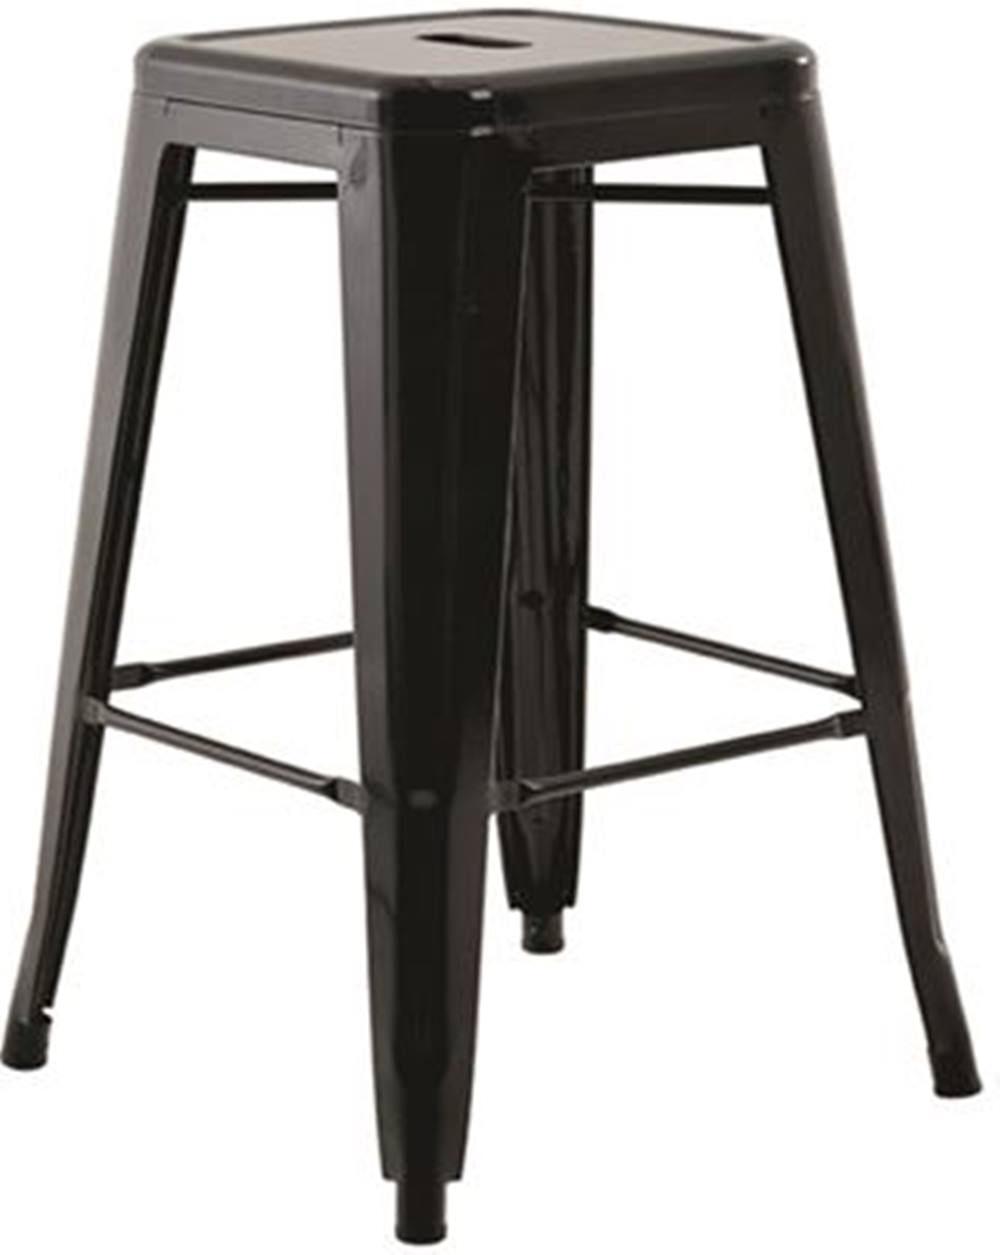 Banqueta Iron Medio Preto 61 cm (ALT) - 43431